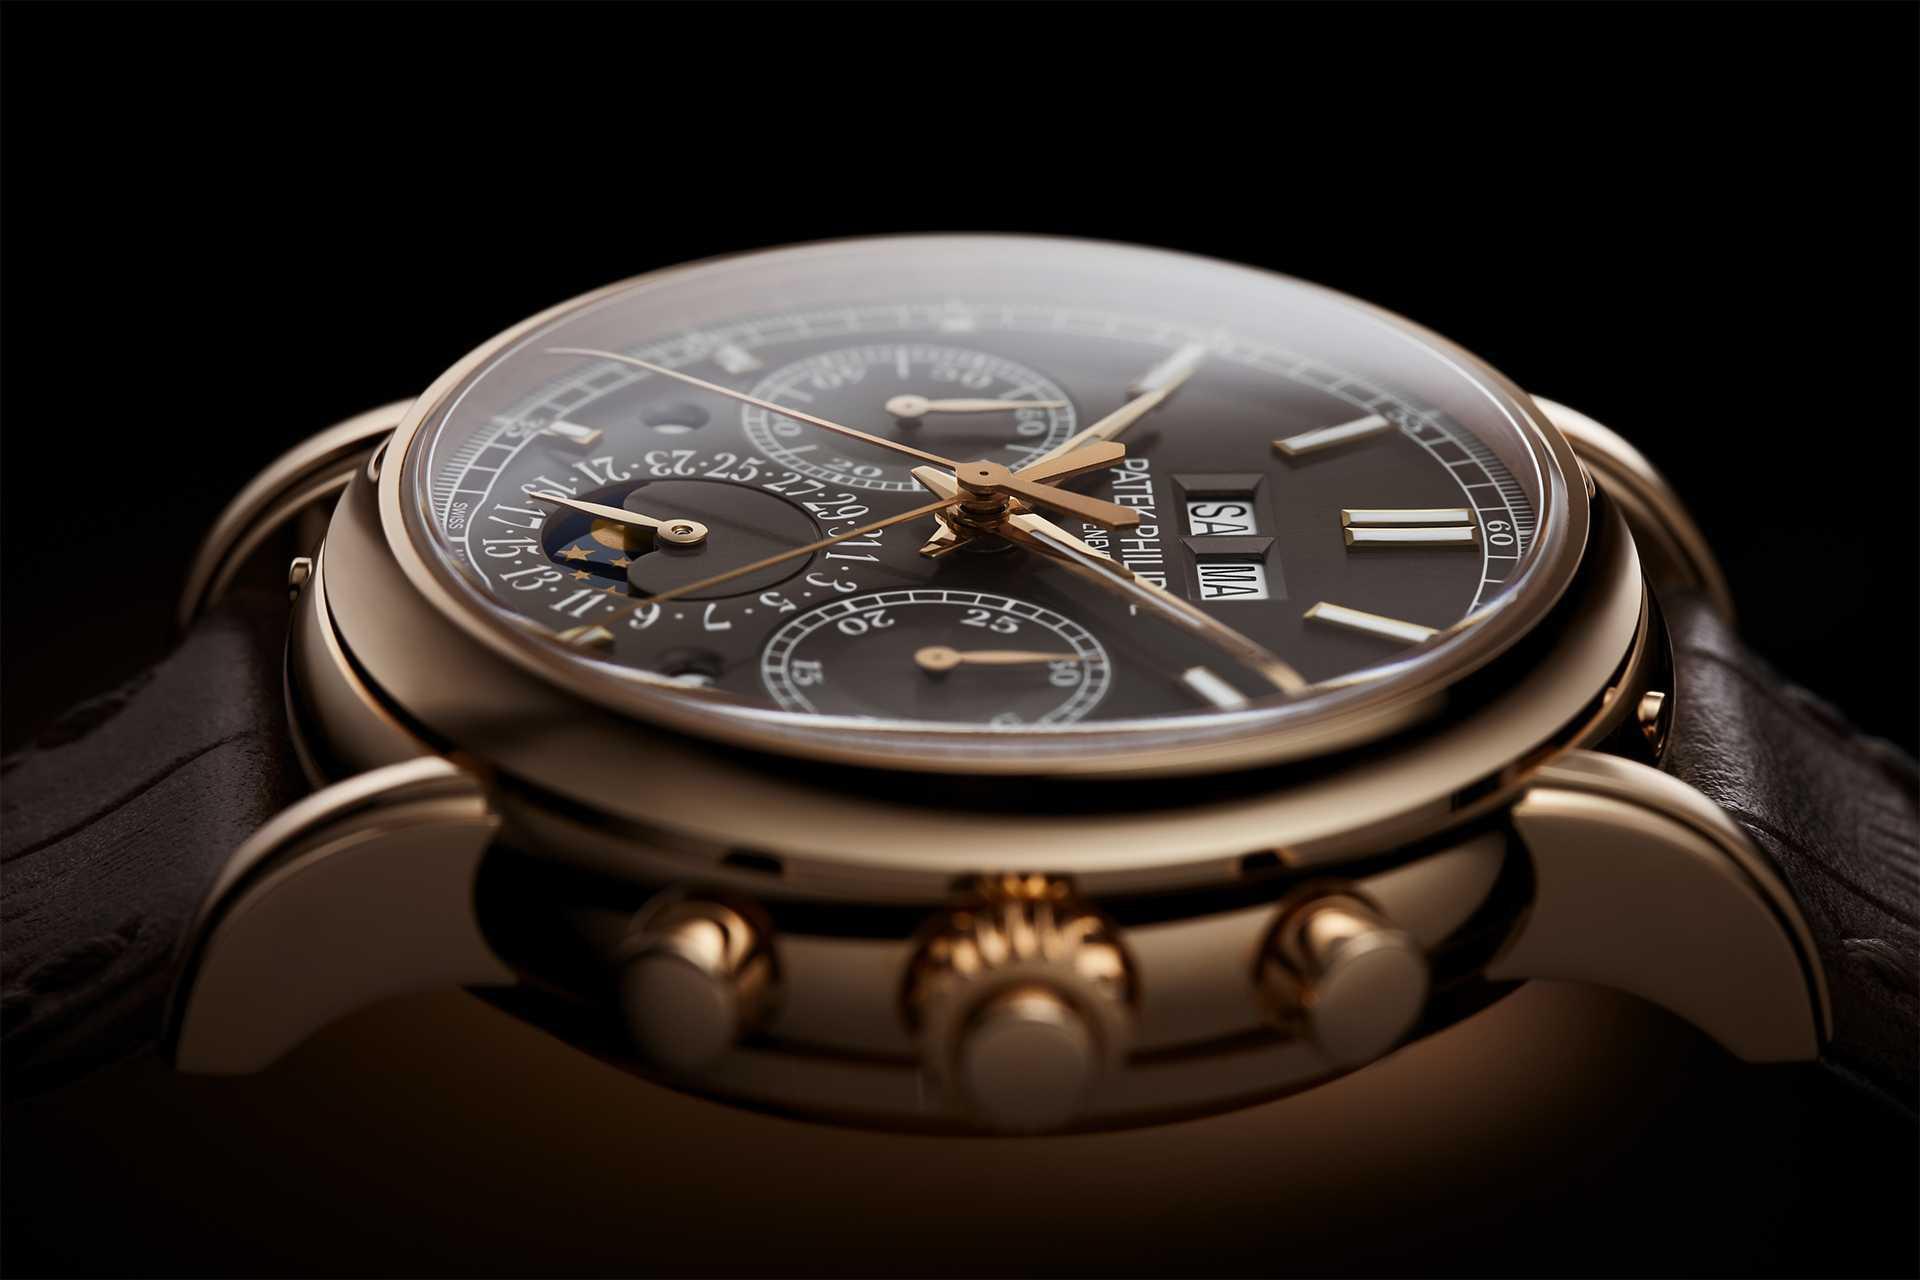 Patek Philippe split-seconds chronograph and perpetual calendar Ref. 5204R-011